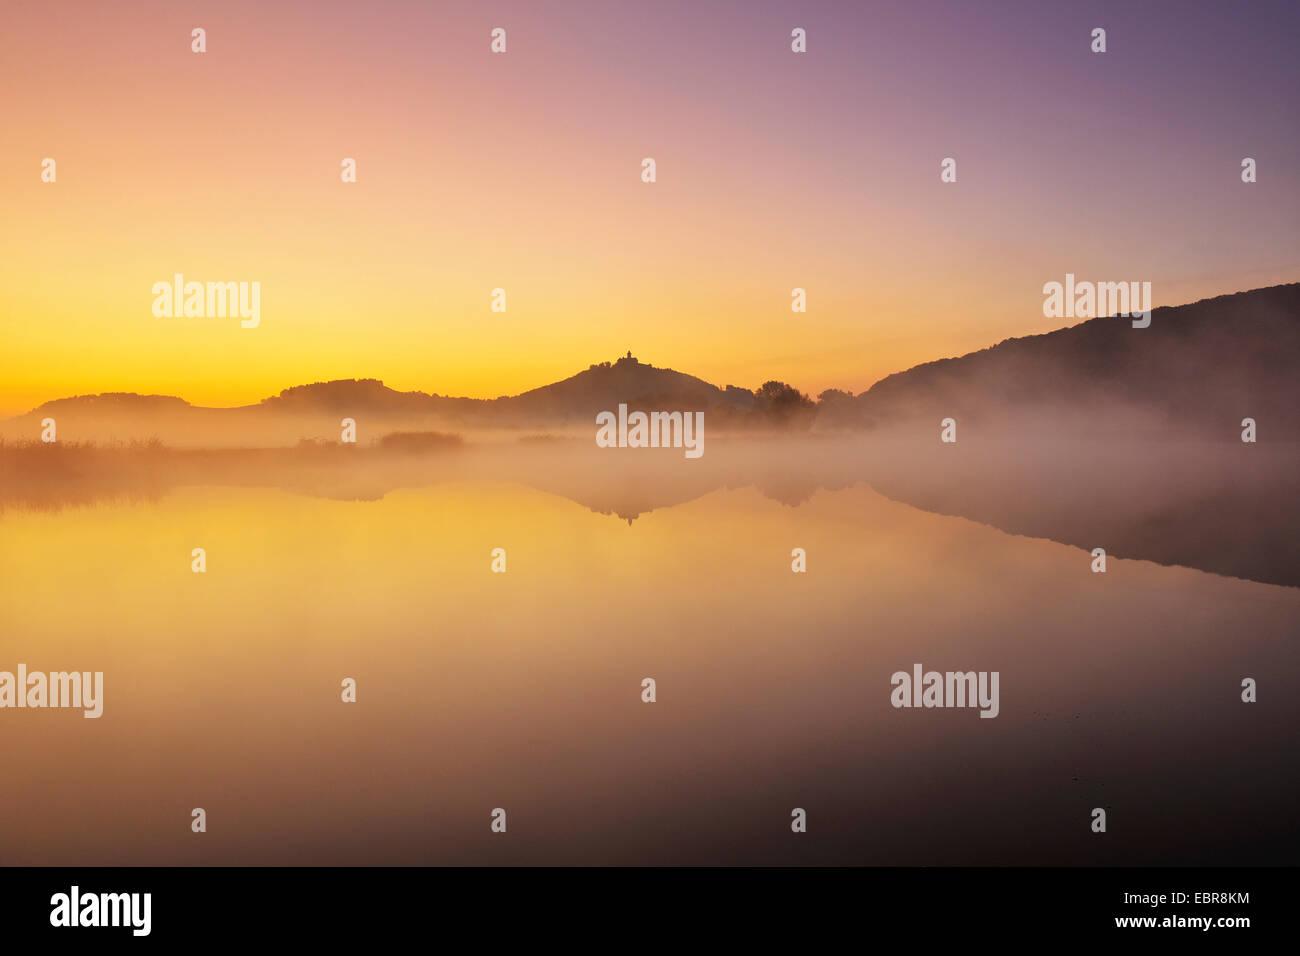 Wachsenburg in morning mist reflecting in a lake, Germany, Thueringen, Drei Gleichen - Stock Image